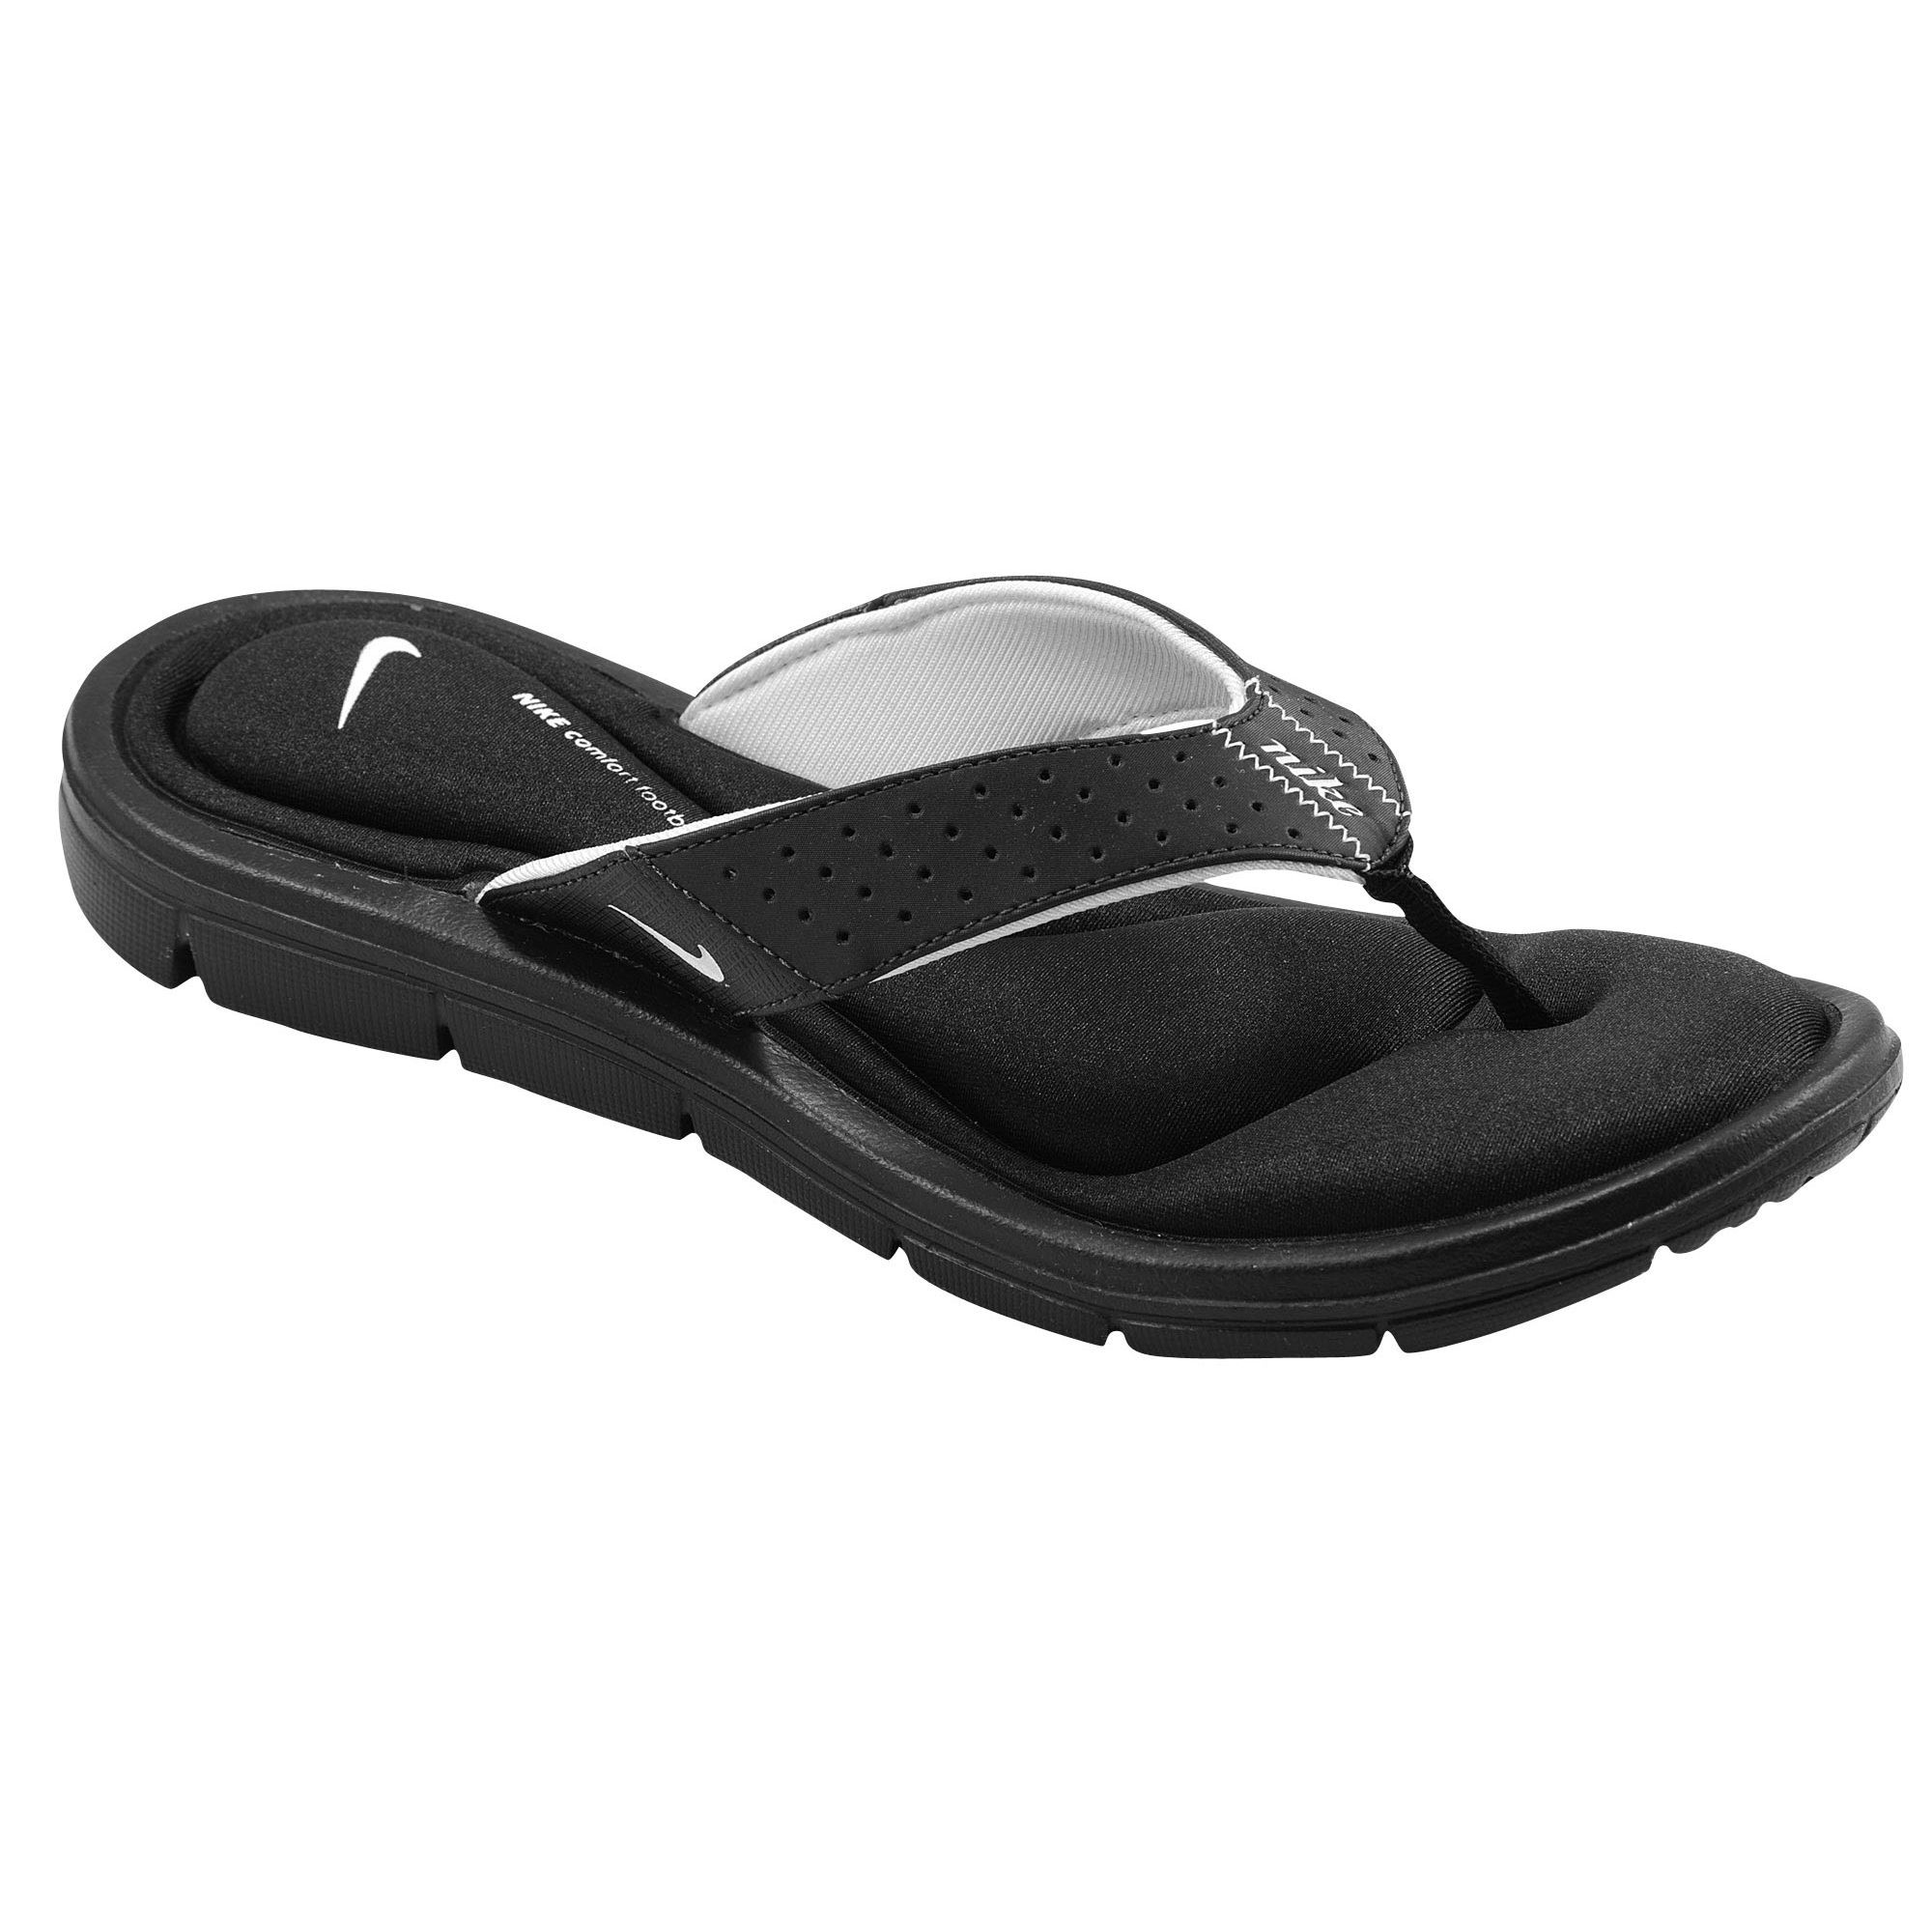 comforter athletic comfort s benassi sandals jdi shoe nike thong women black womens sensation